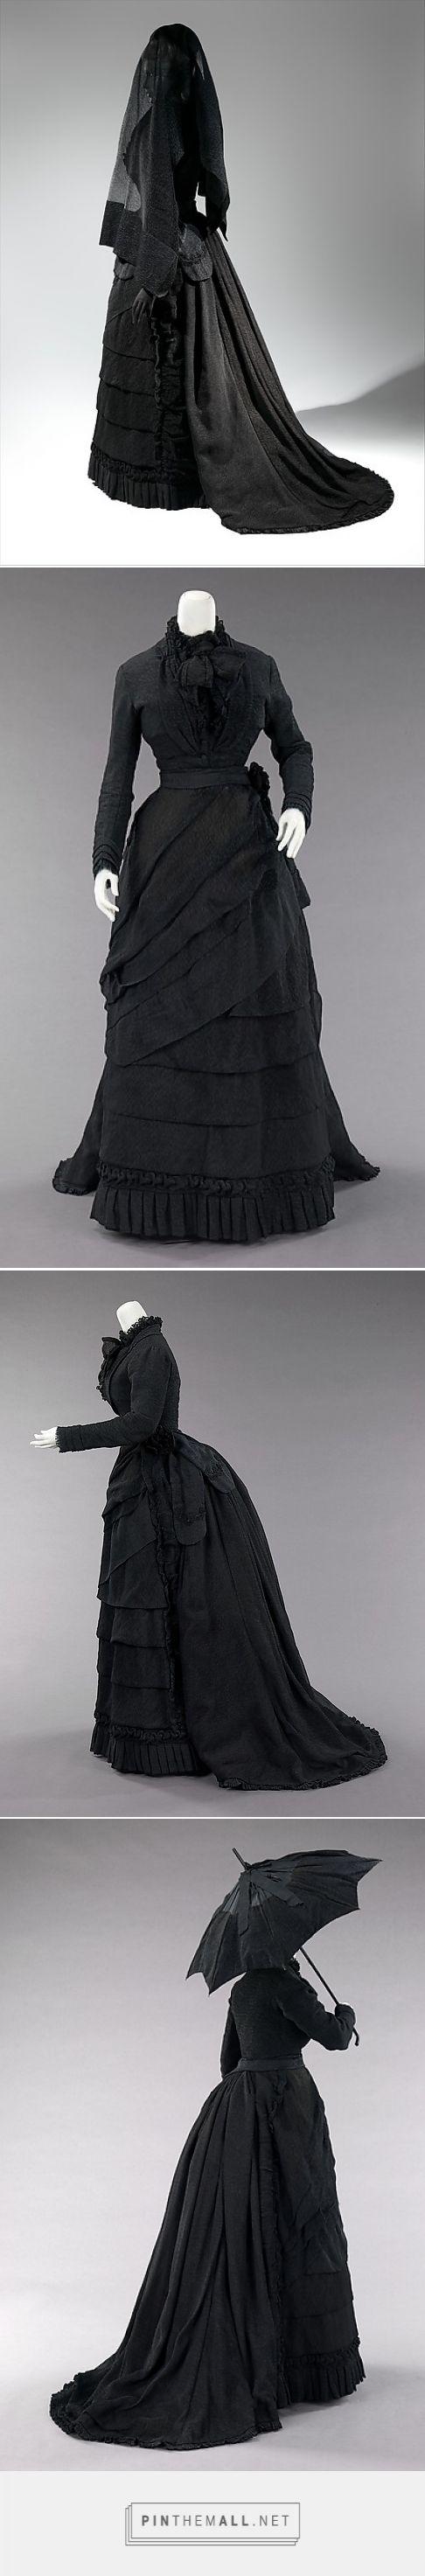 Mourning ensemble 1870-72 American   The Metropolitan Museum of Art